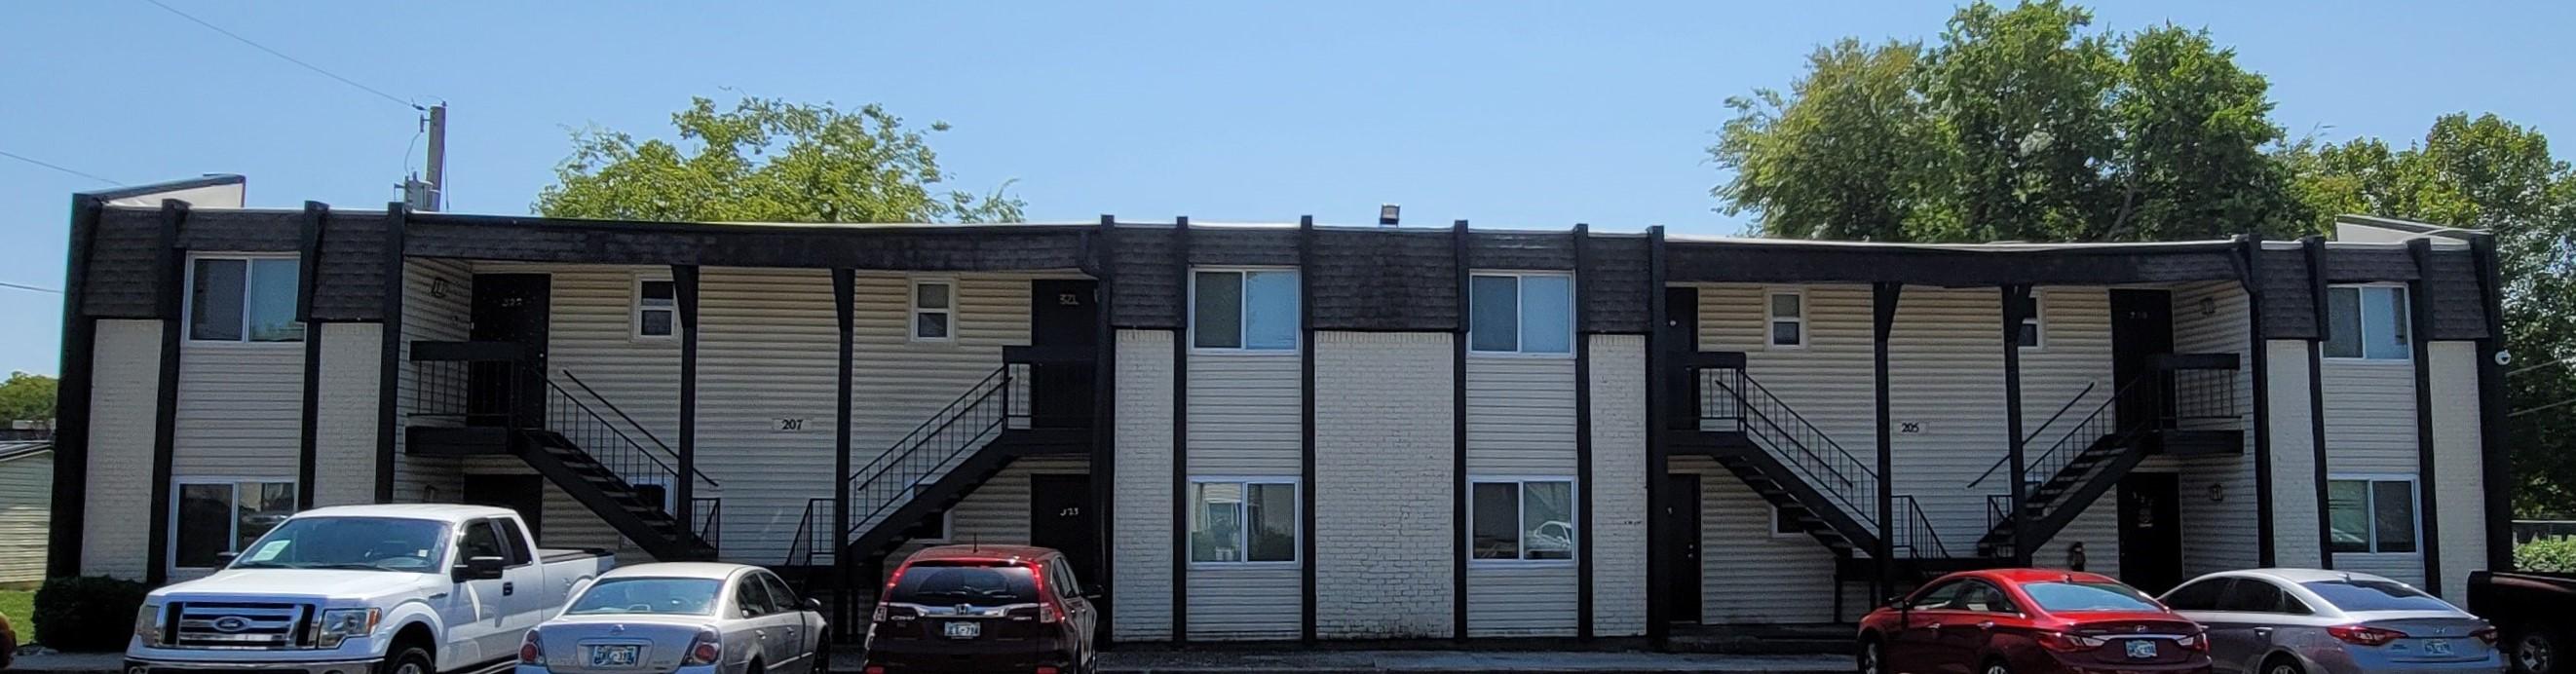 Property image - Wood Creek Apartments